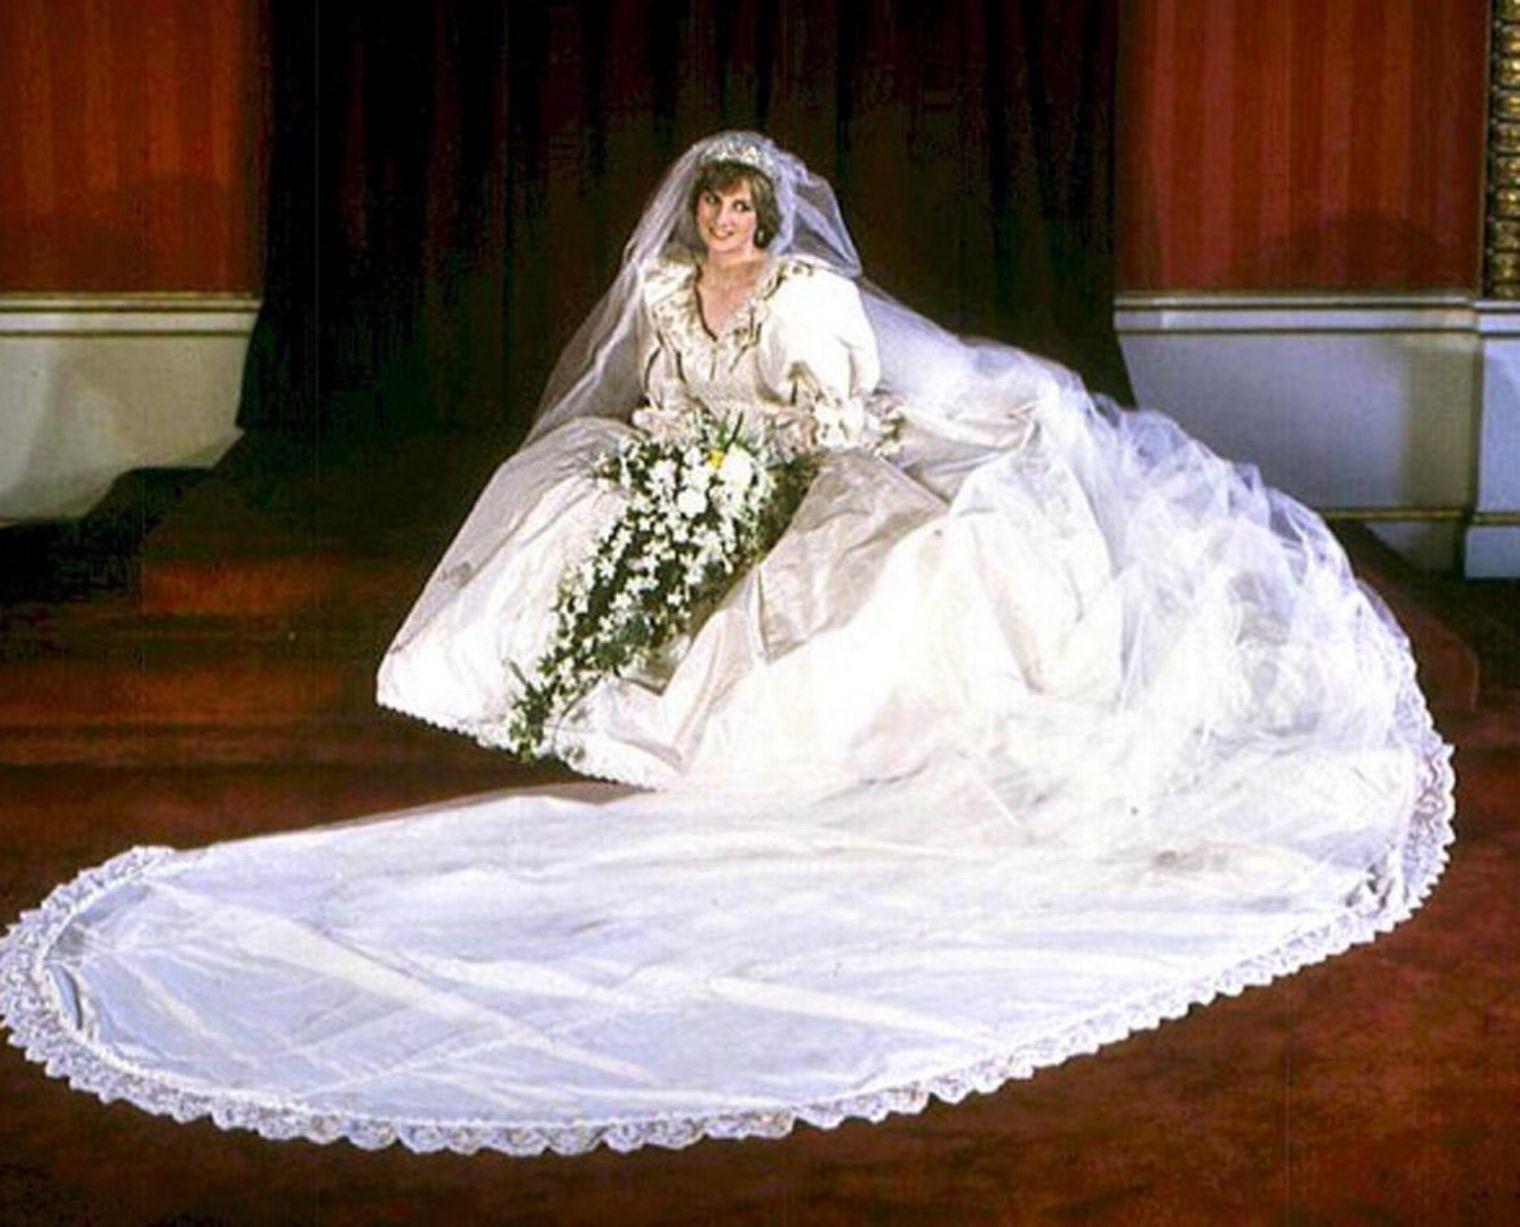 Sarah burton wedding dress  Royals unightmare after Princess Dianaus deathu revealed in letter